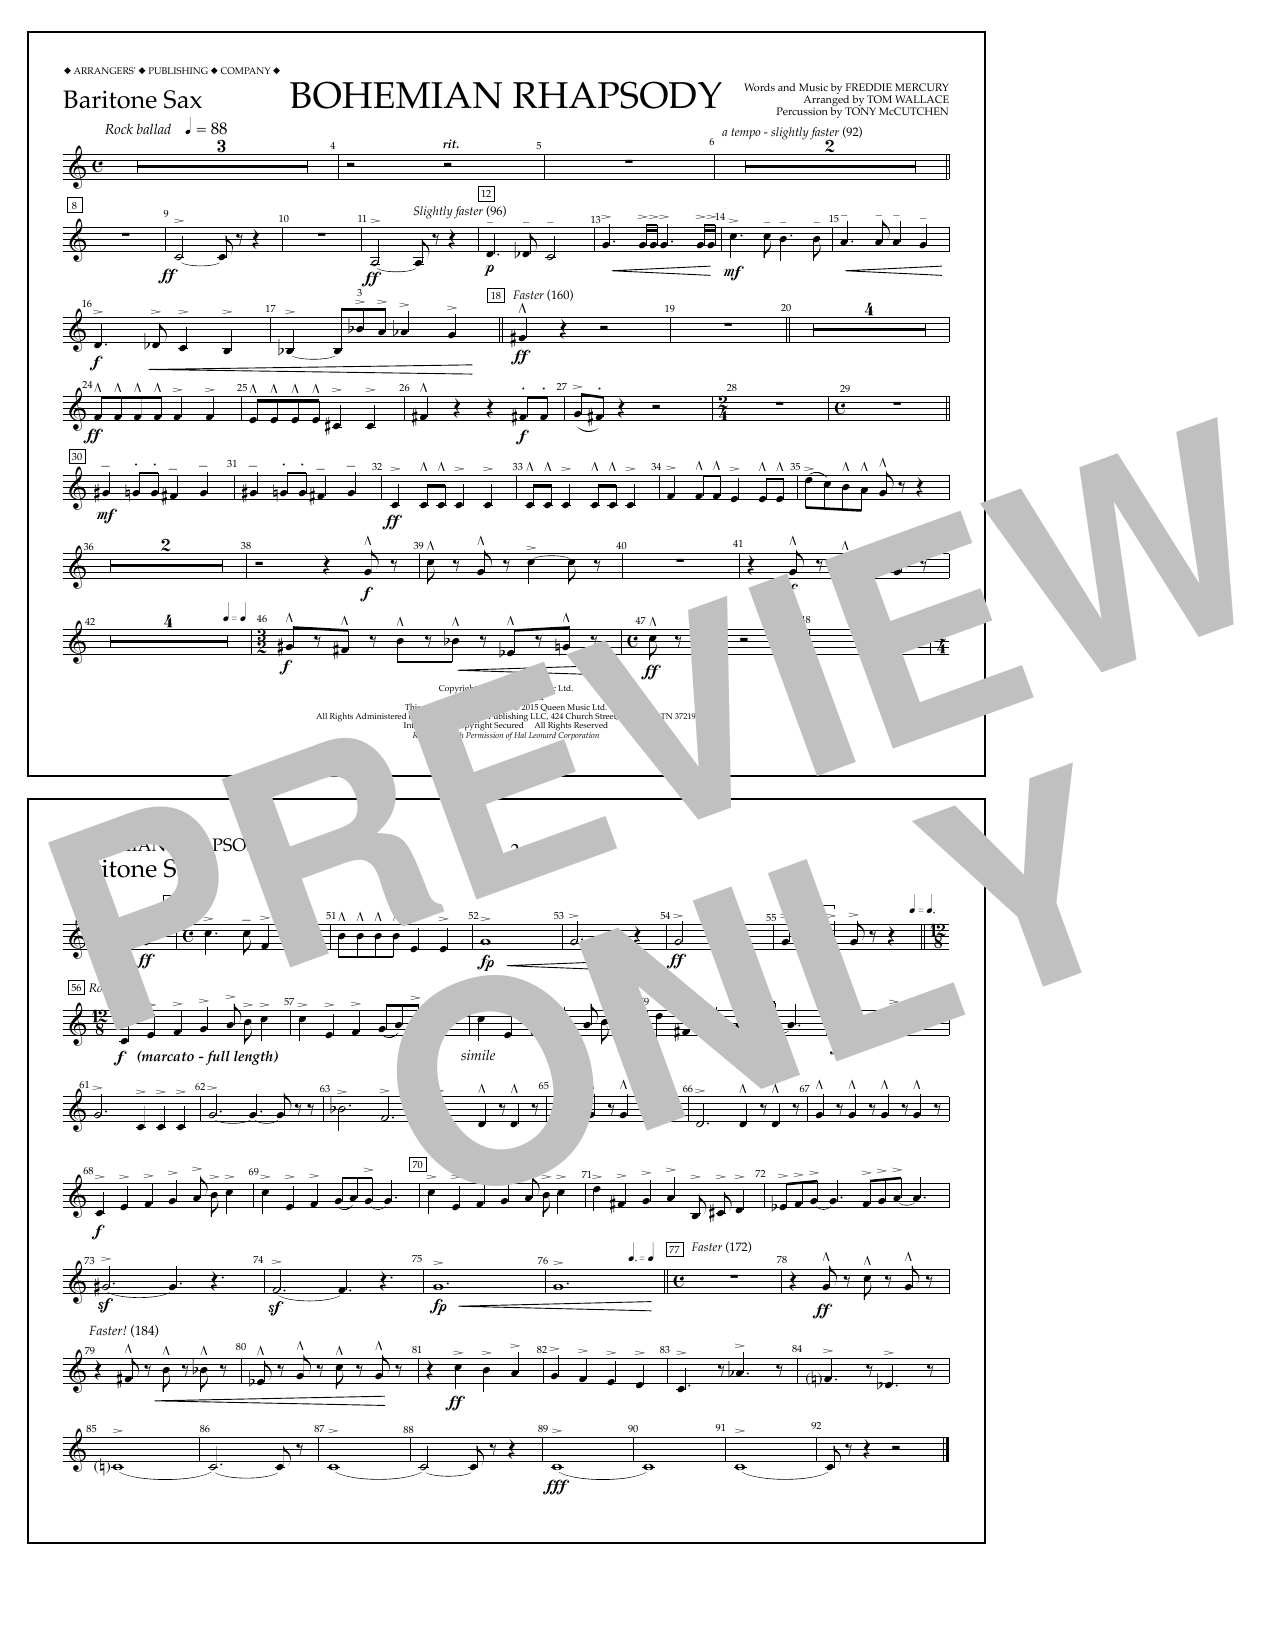 Bohemian Rhapsody - Baritone Sax Sheet Music